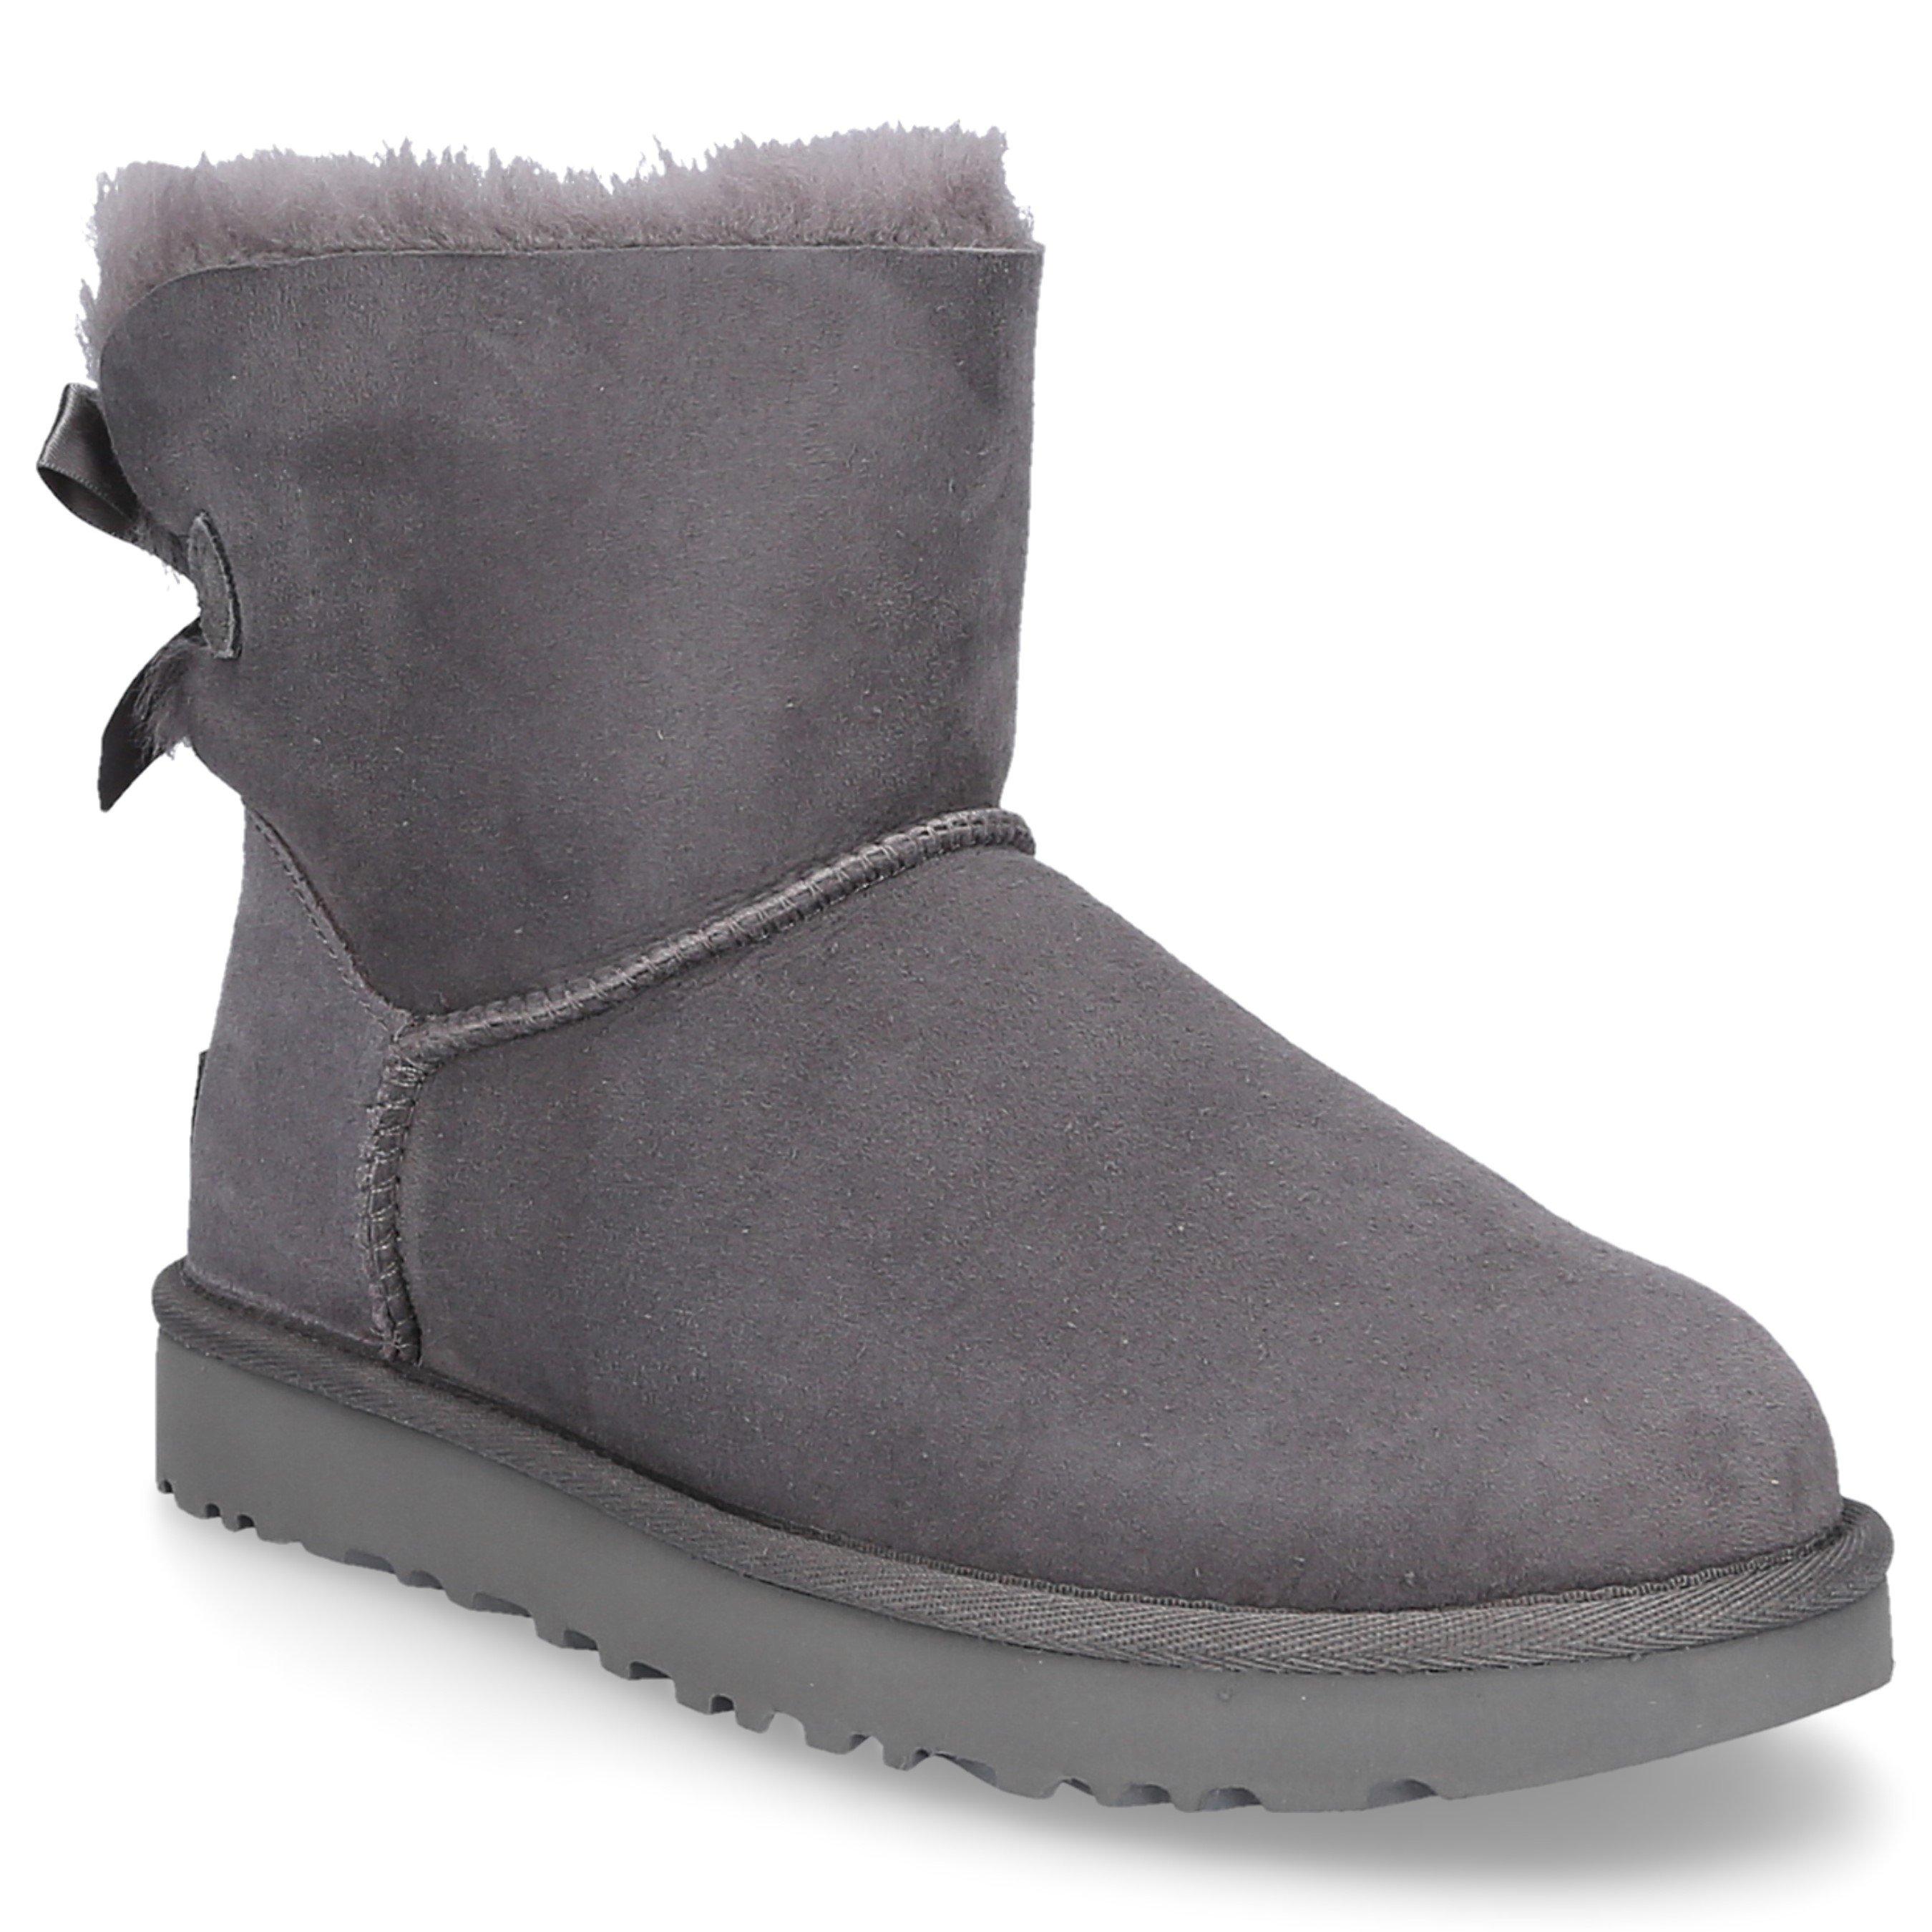 Snowboots Mini Bailey Bow Ii Lammleder Grau In Grey